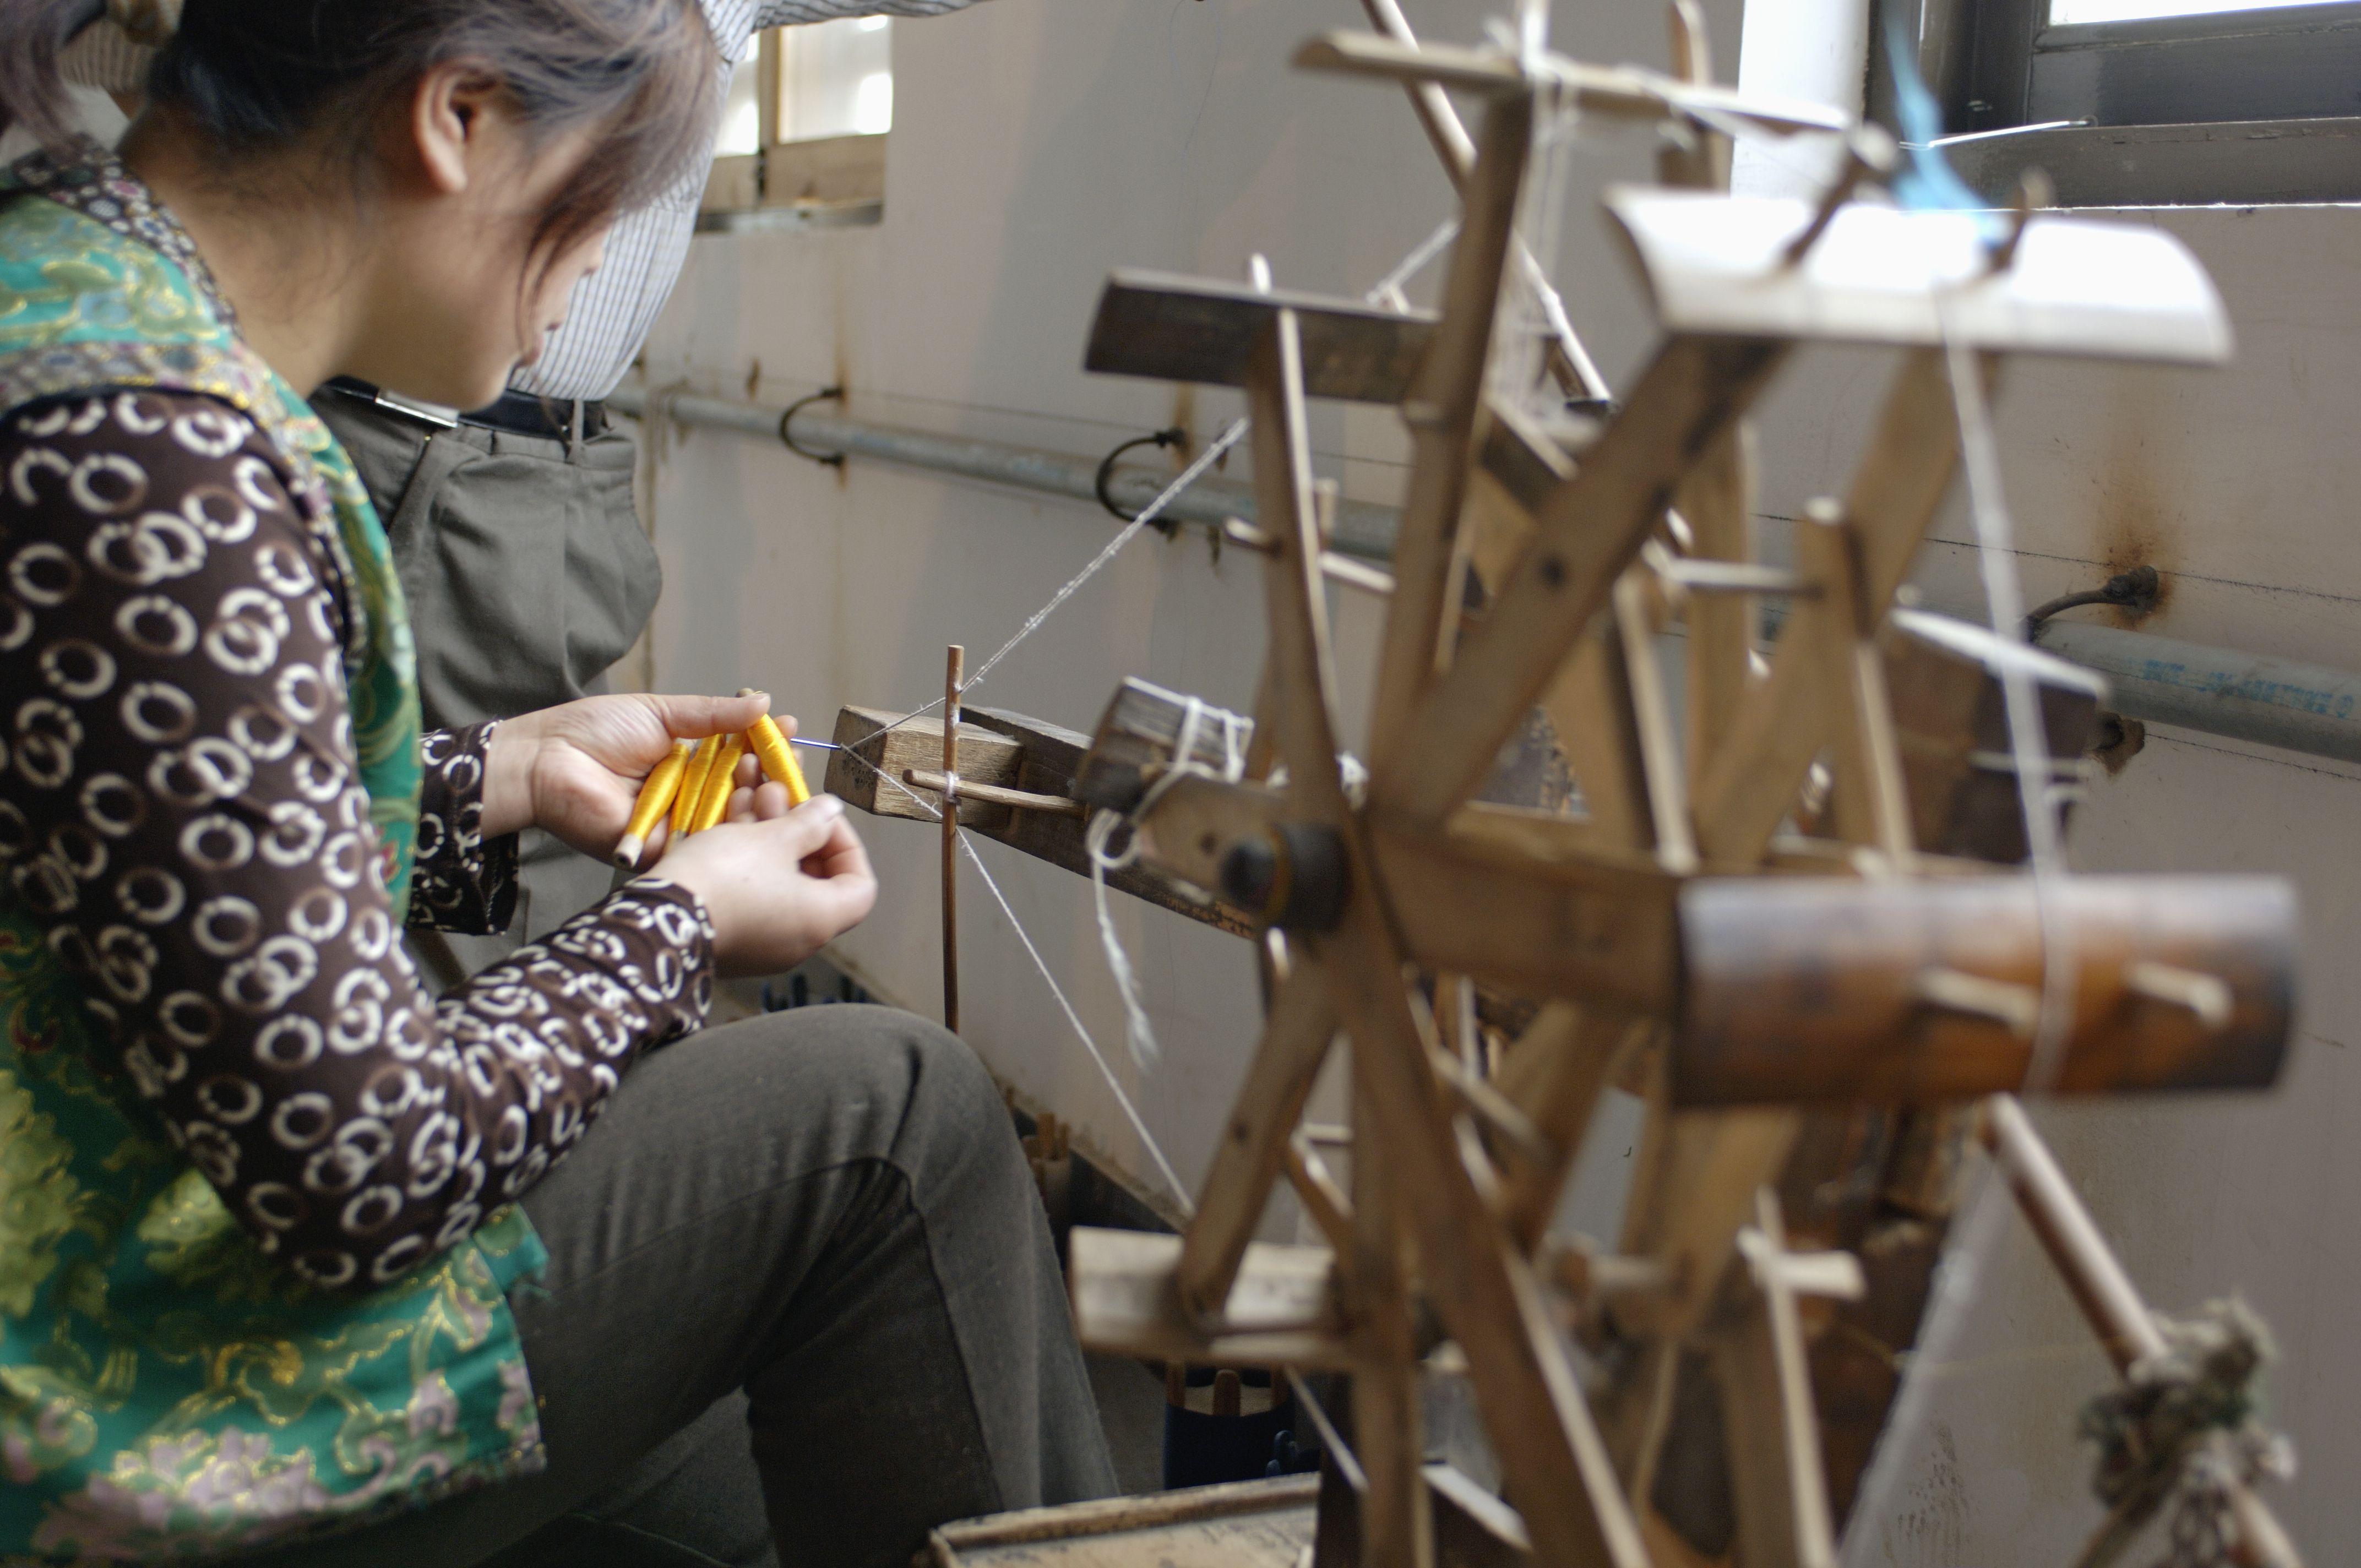 Silk weaving in China, using historic methods